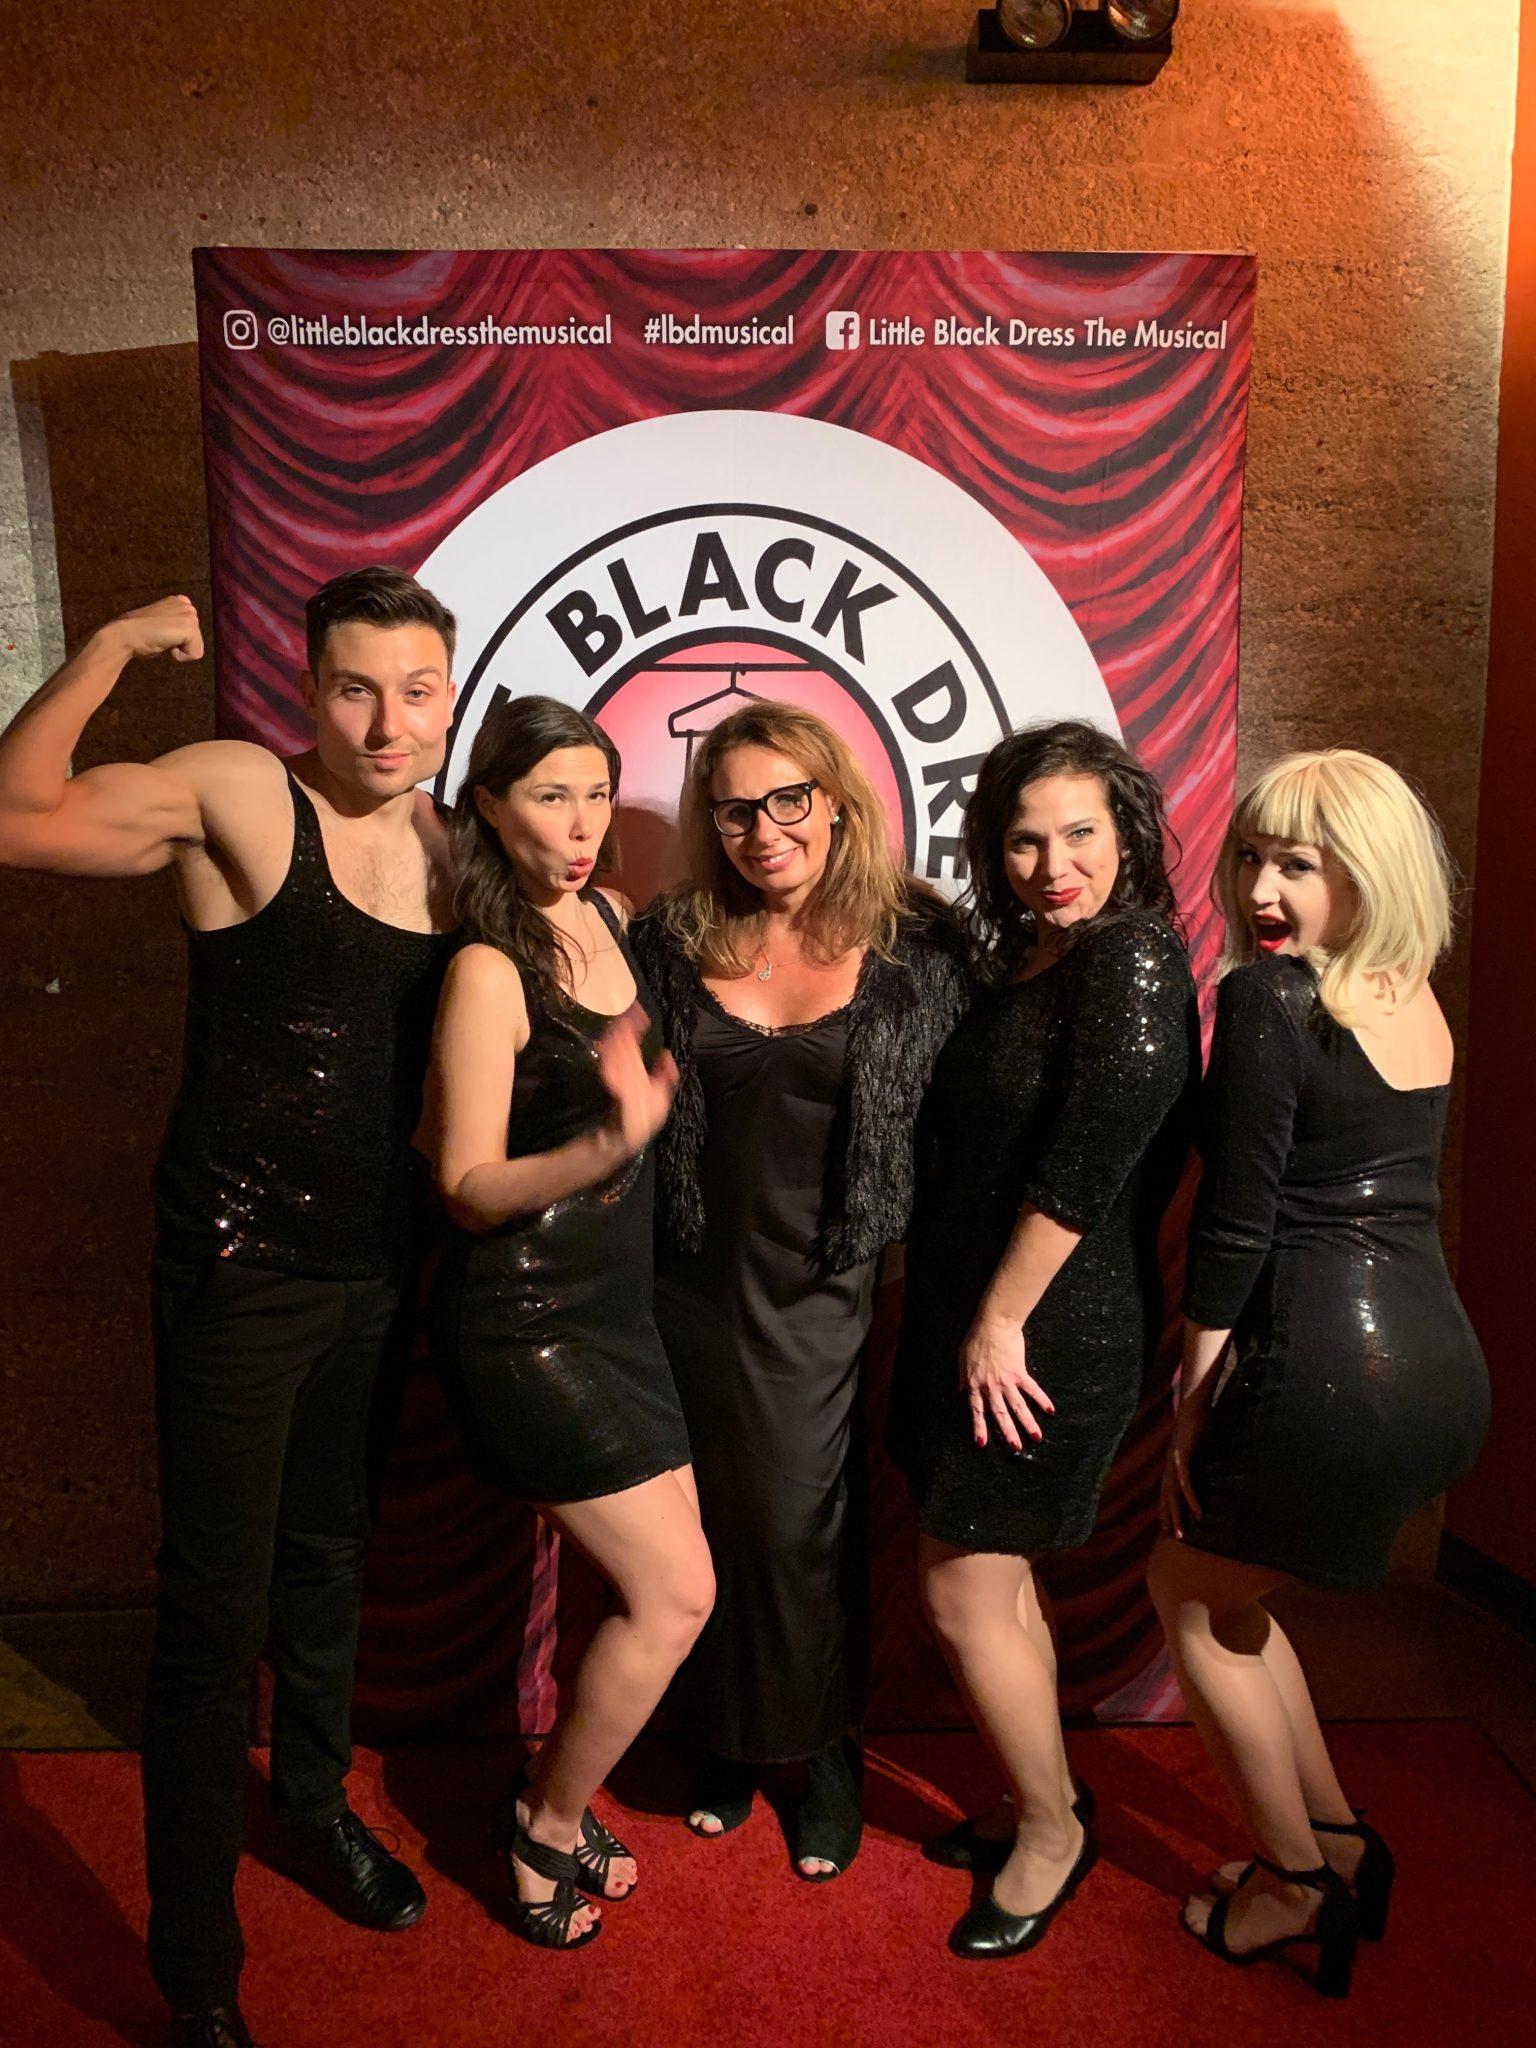 little black dress the musical